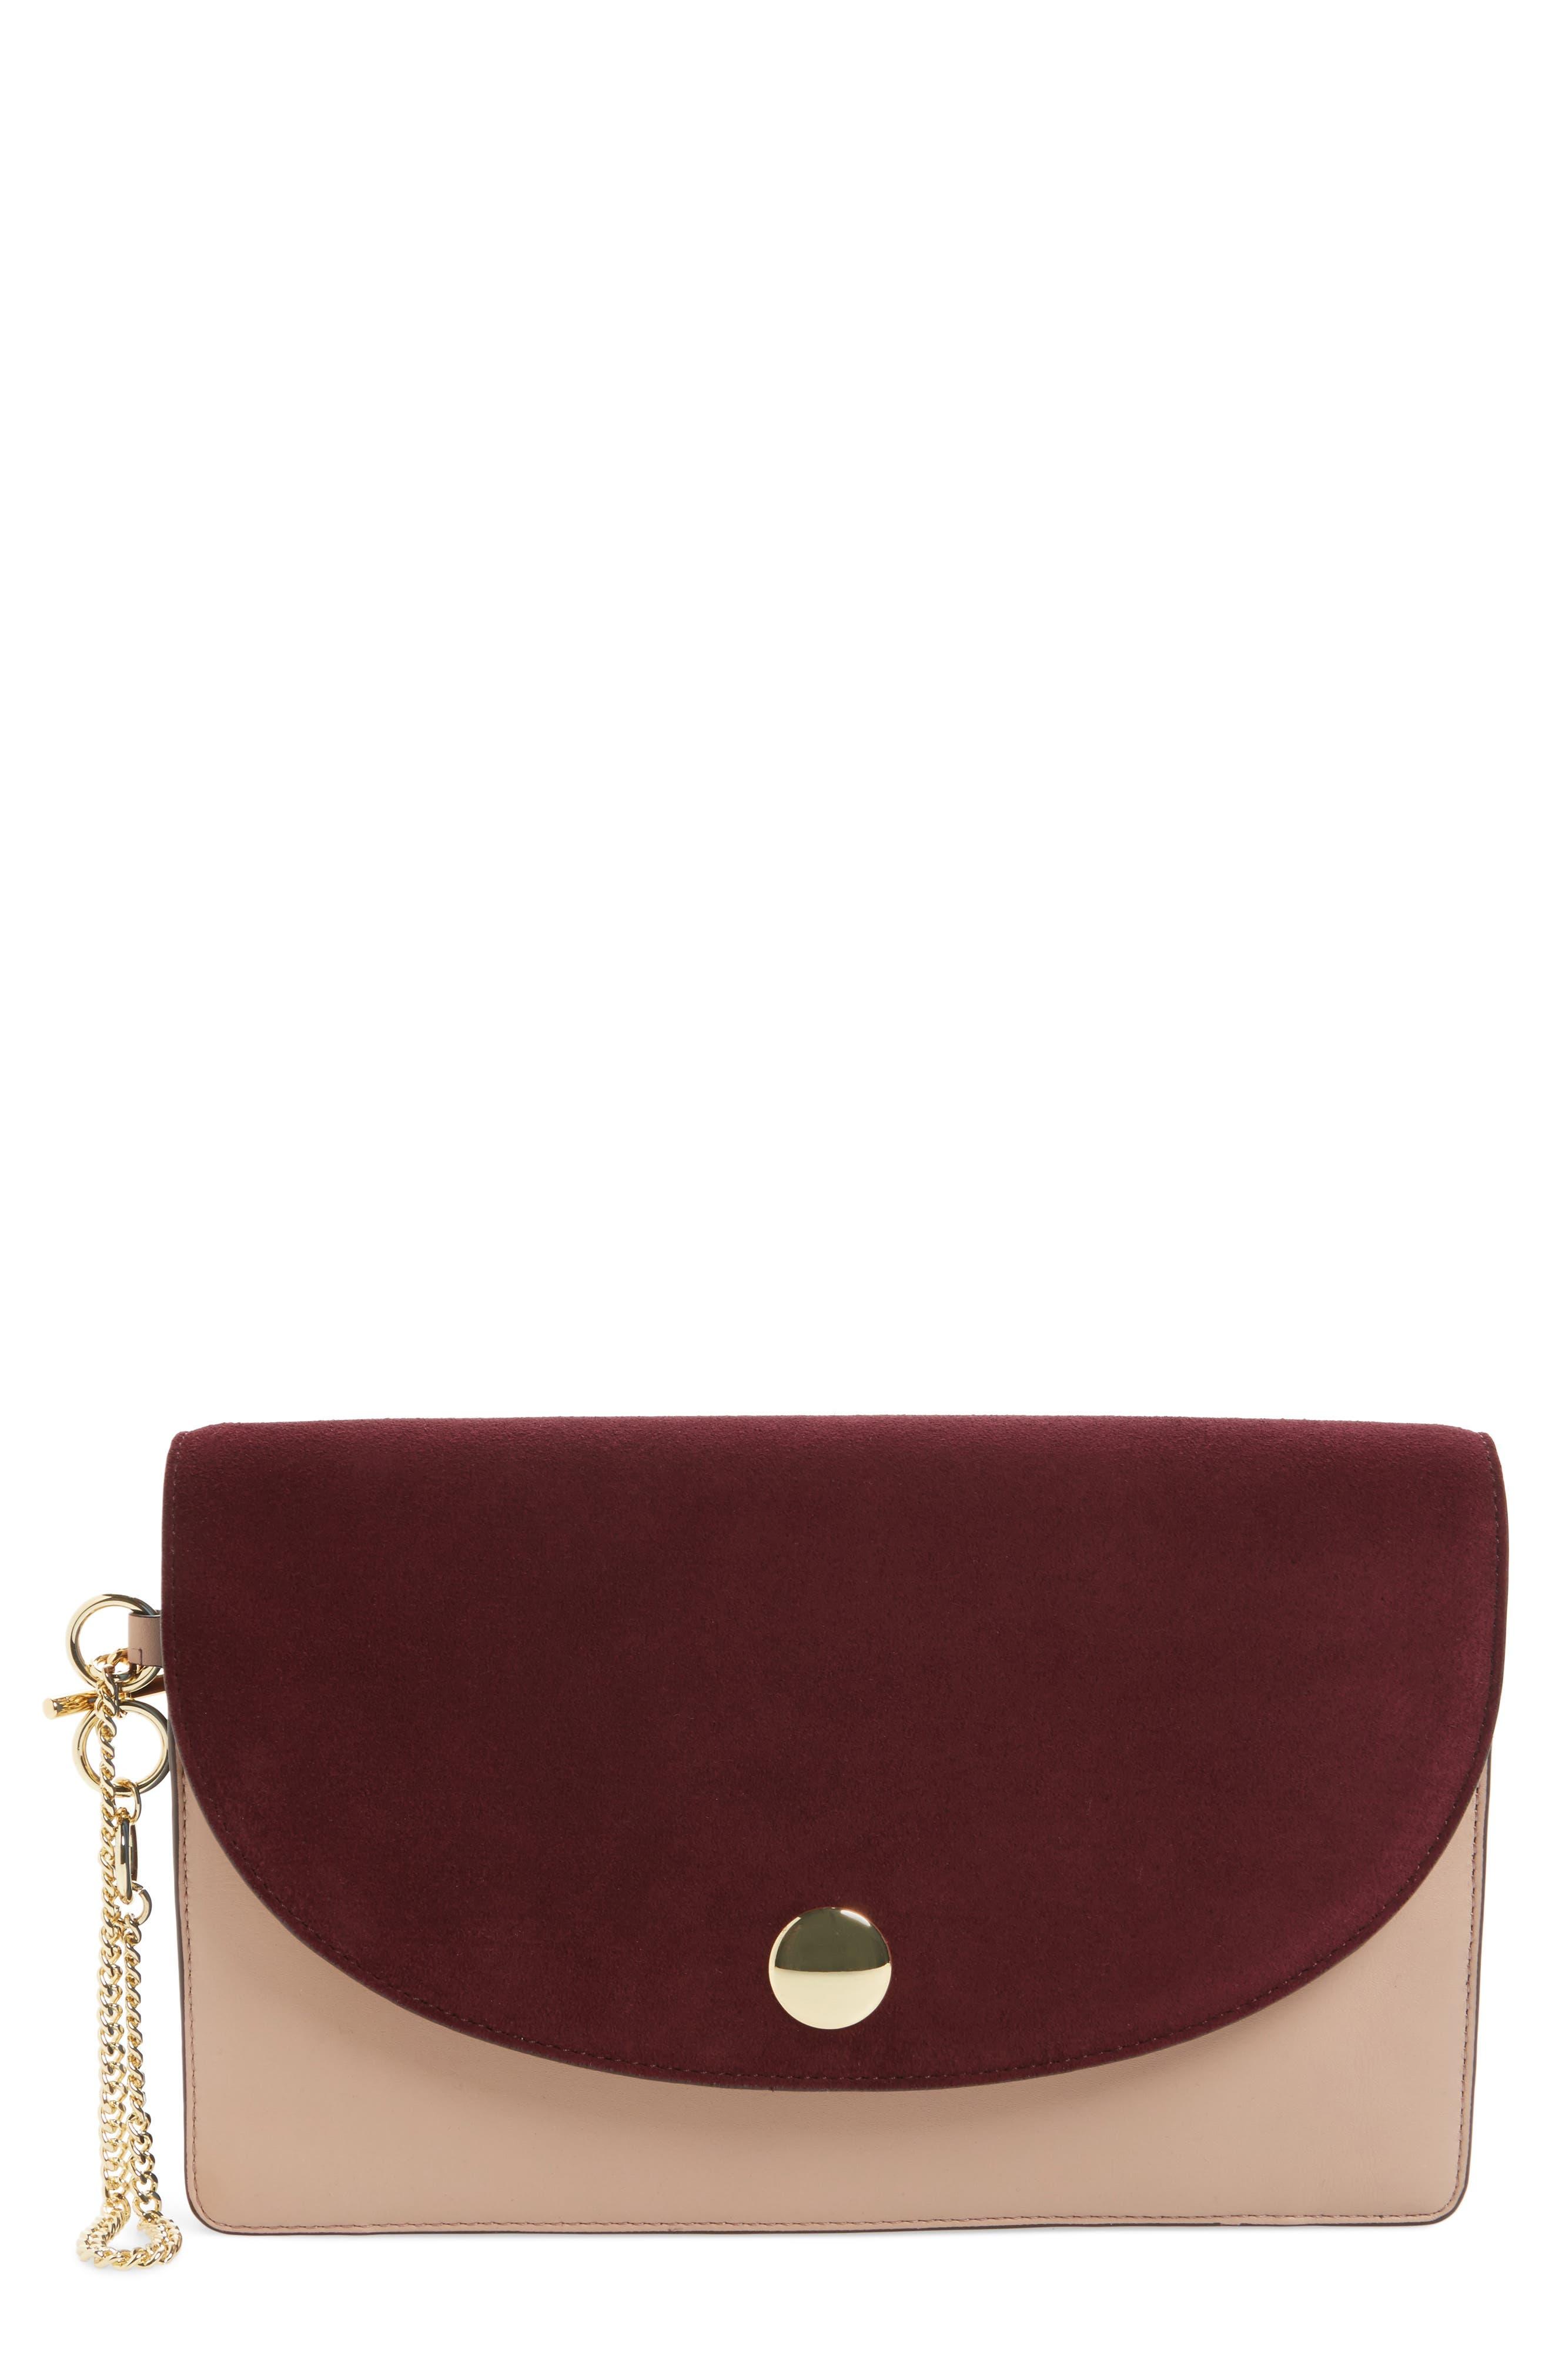 Convertible Leather Saddle Clutch,                             Main thumbnail 1, color,                             Bordeaux/ Dusty Pink